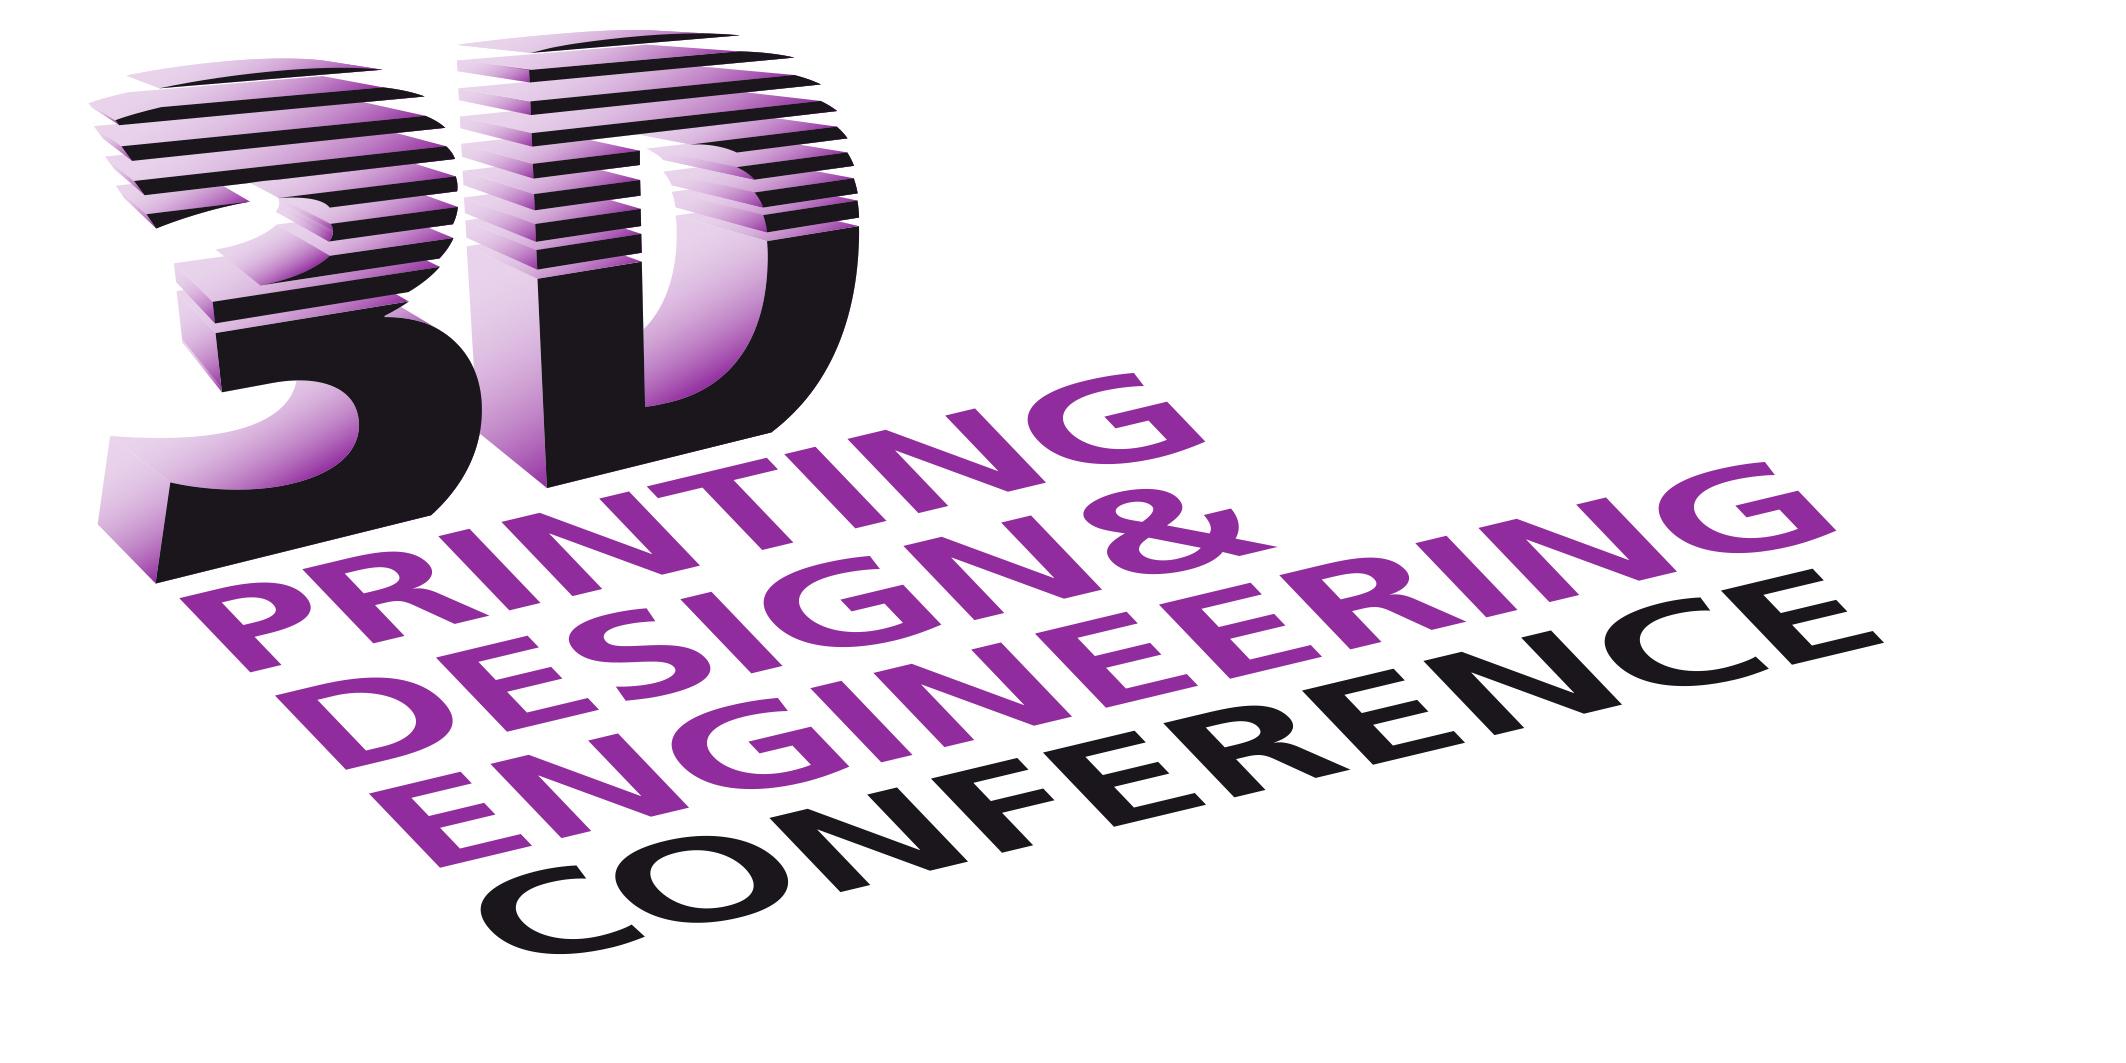 3DPrintingDesign&EngineeringConference_RGB_outline